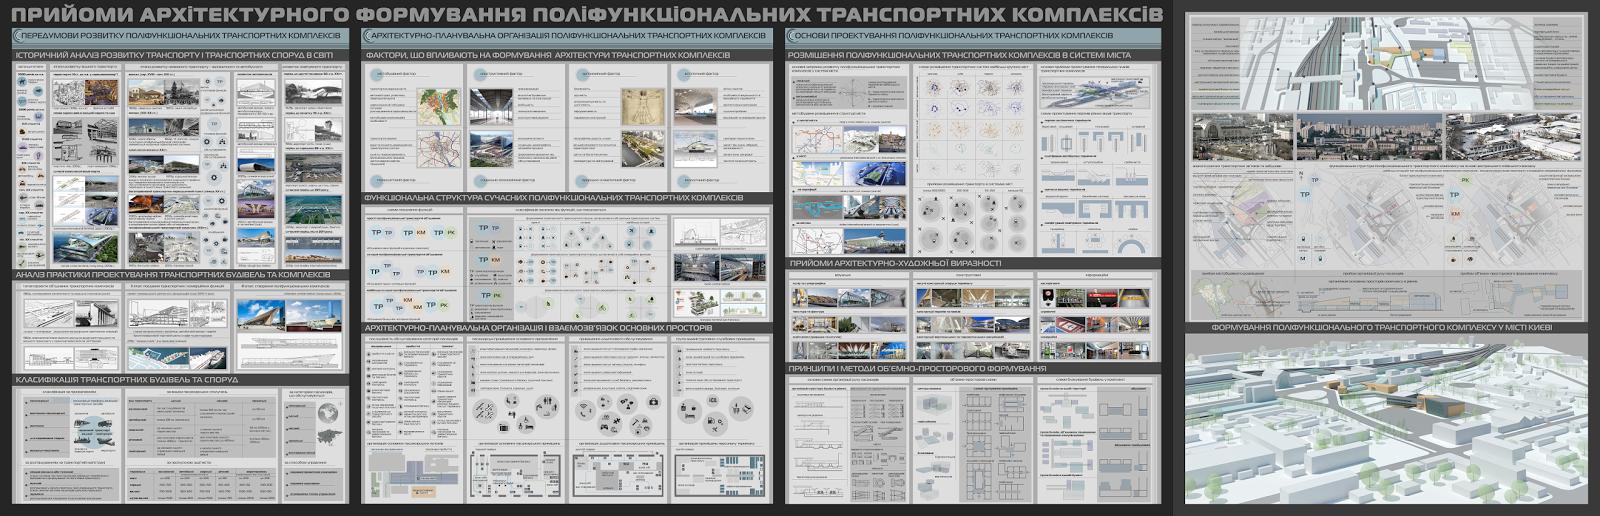 designed by simara Дипломная работа магистра КиСи  Дипломная работа магистра КиСи 2015